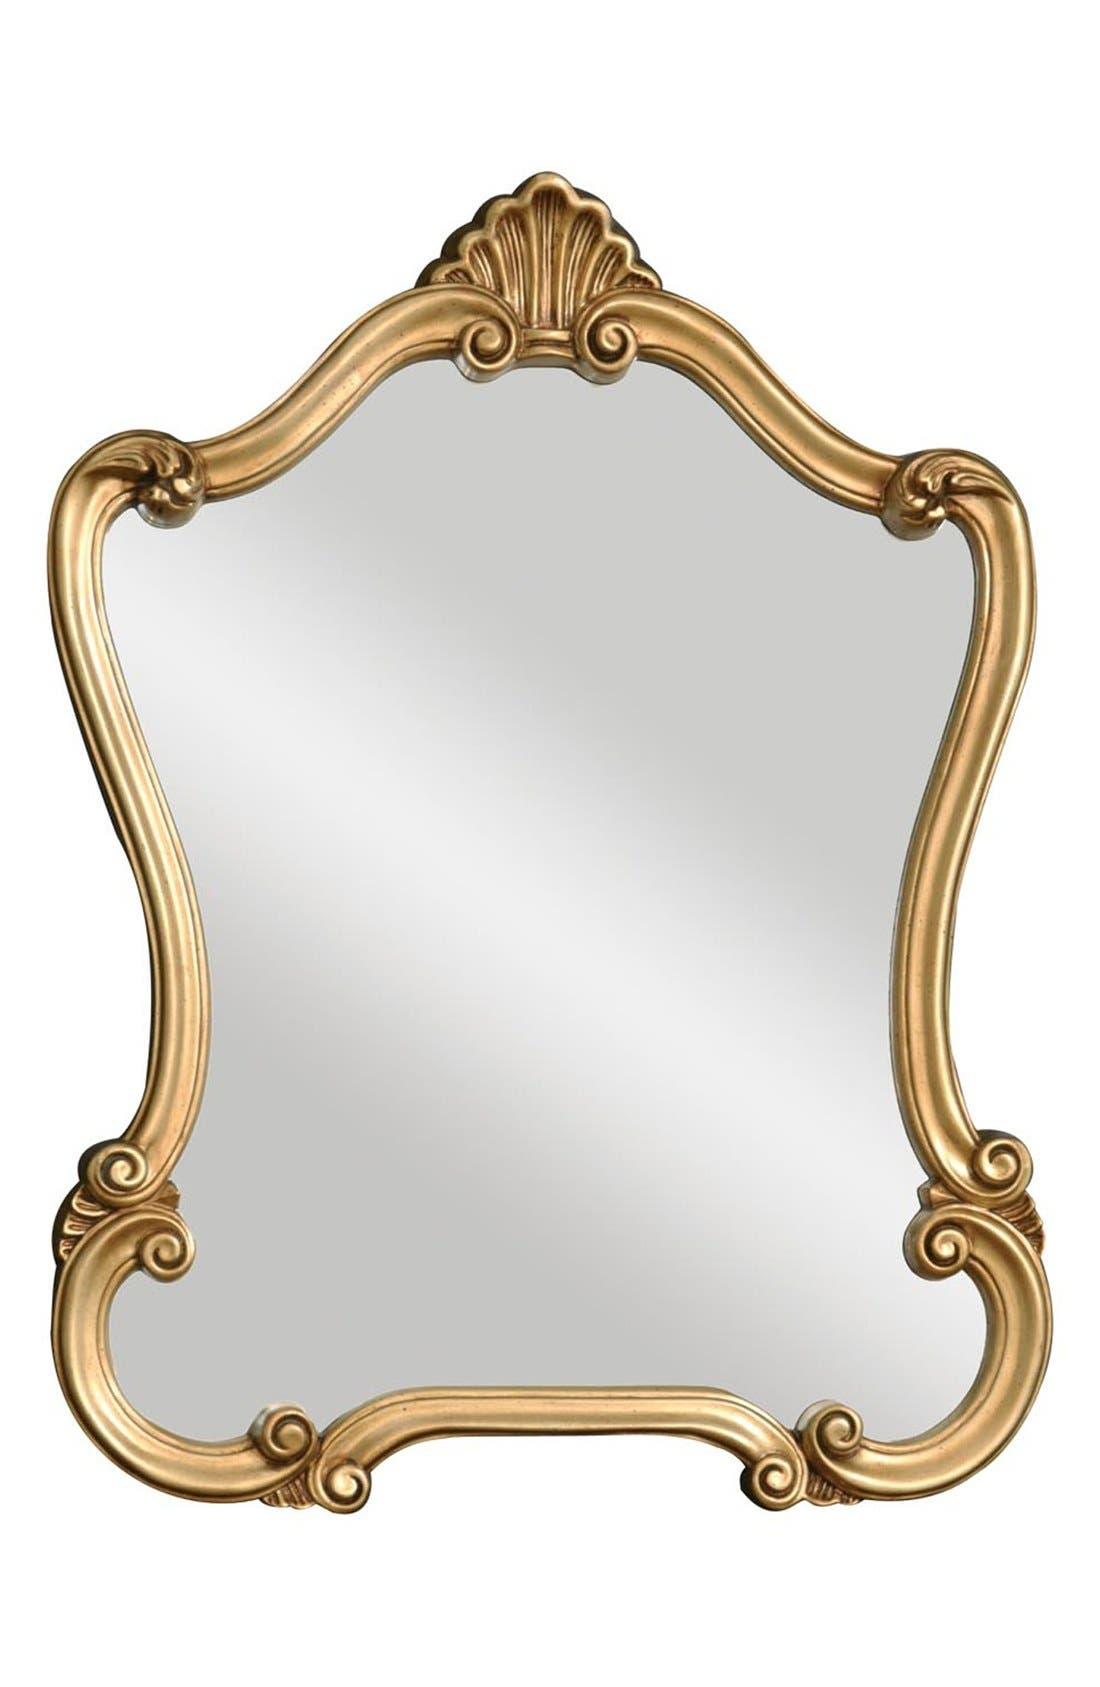 Main Image - Uttermost 'Walton Hall' Antiqued Goldtone Vanity Mirror